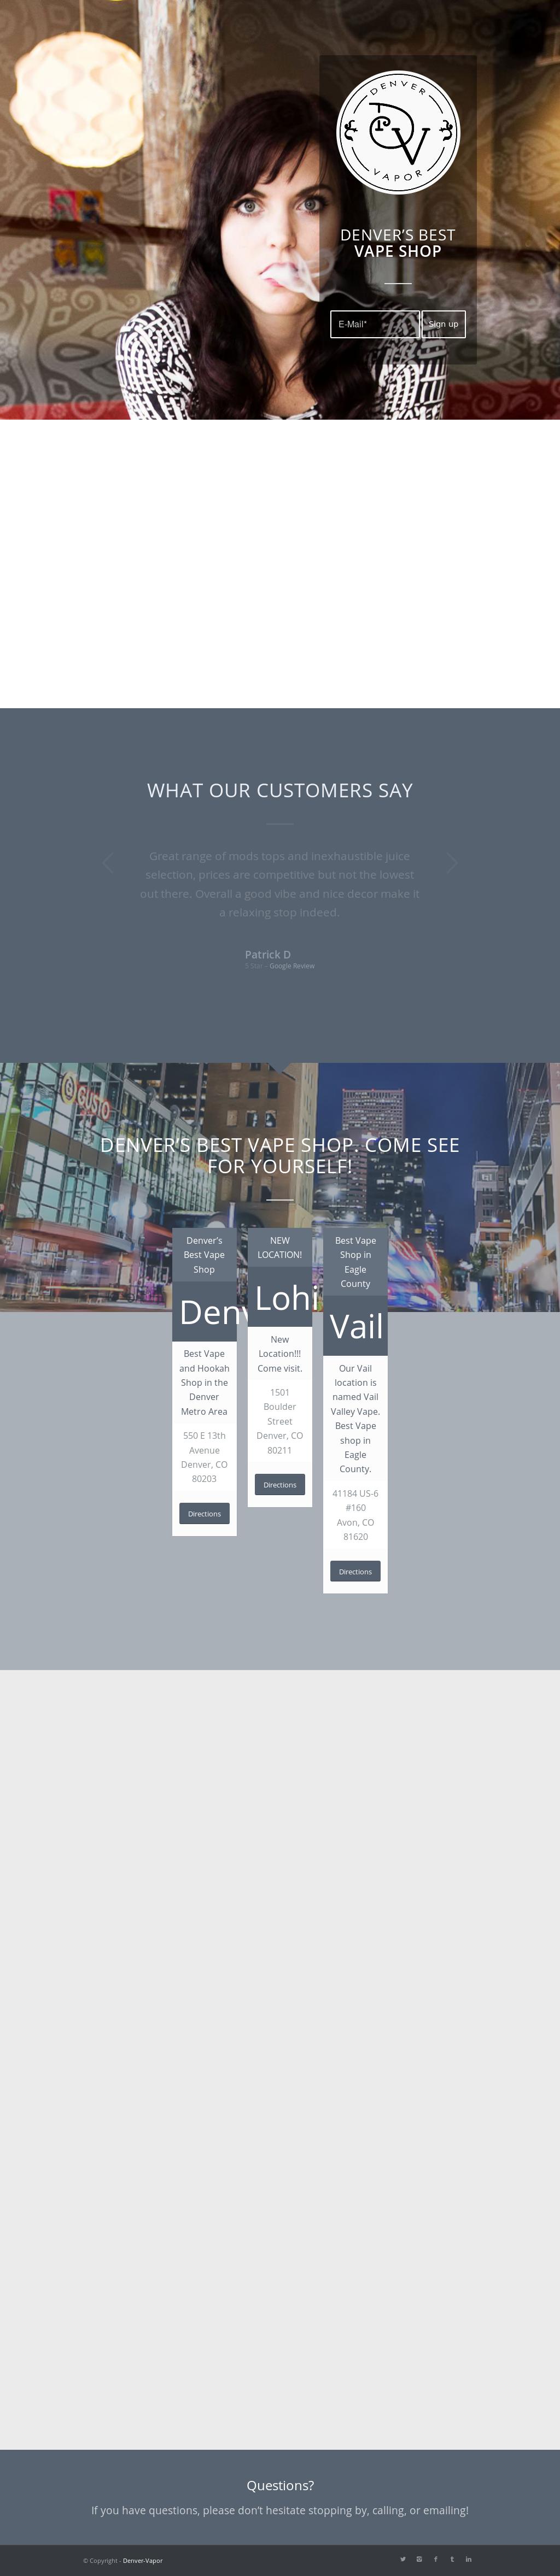 Denver Vapor Competitors, Revenue and Employees - Owler Company Profile